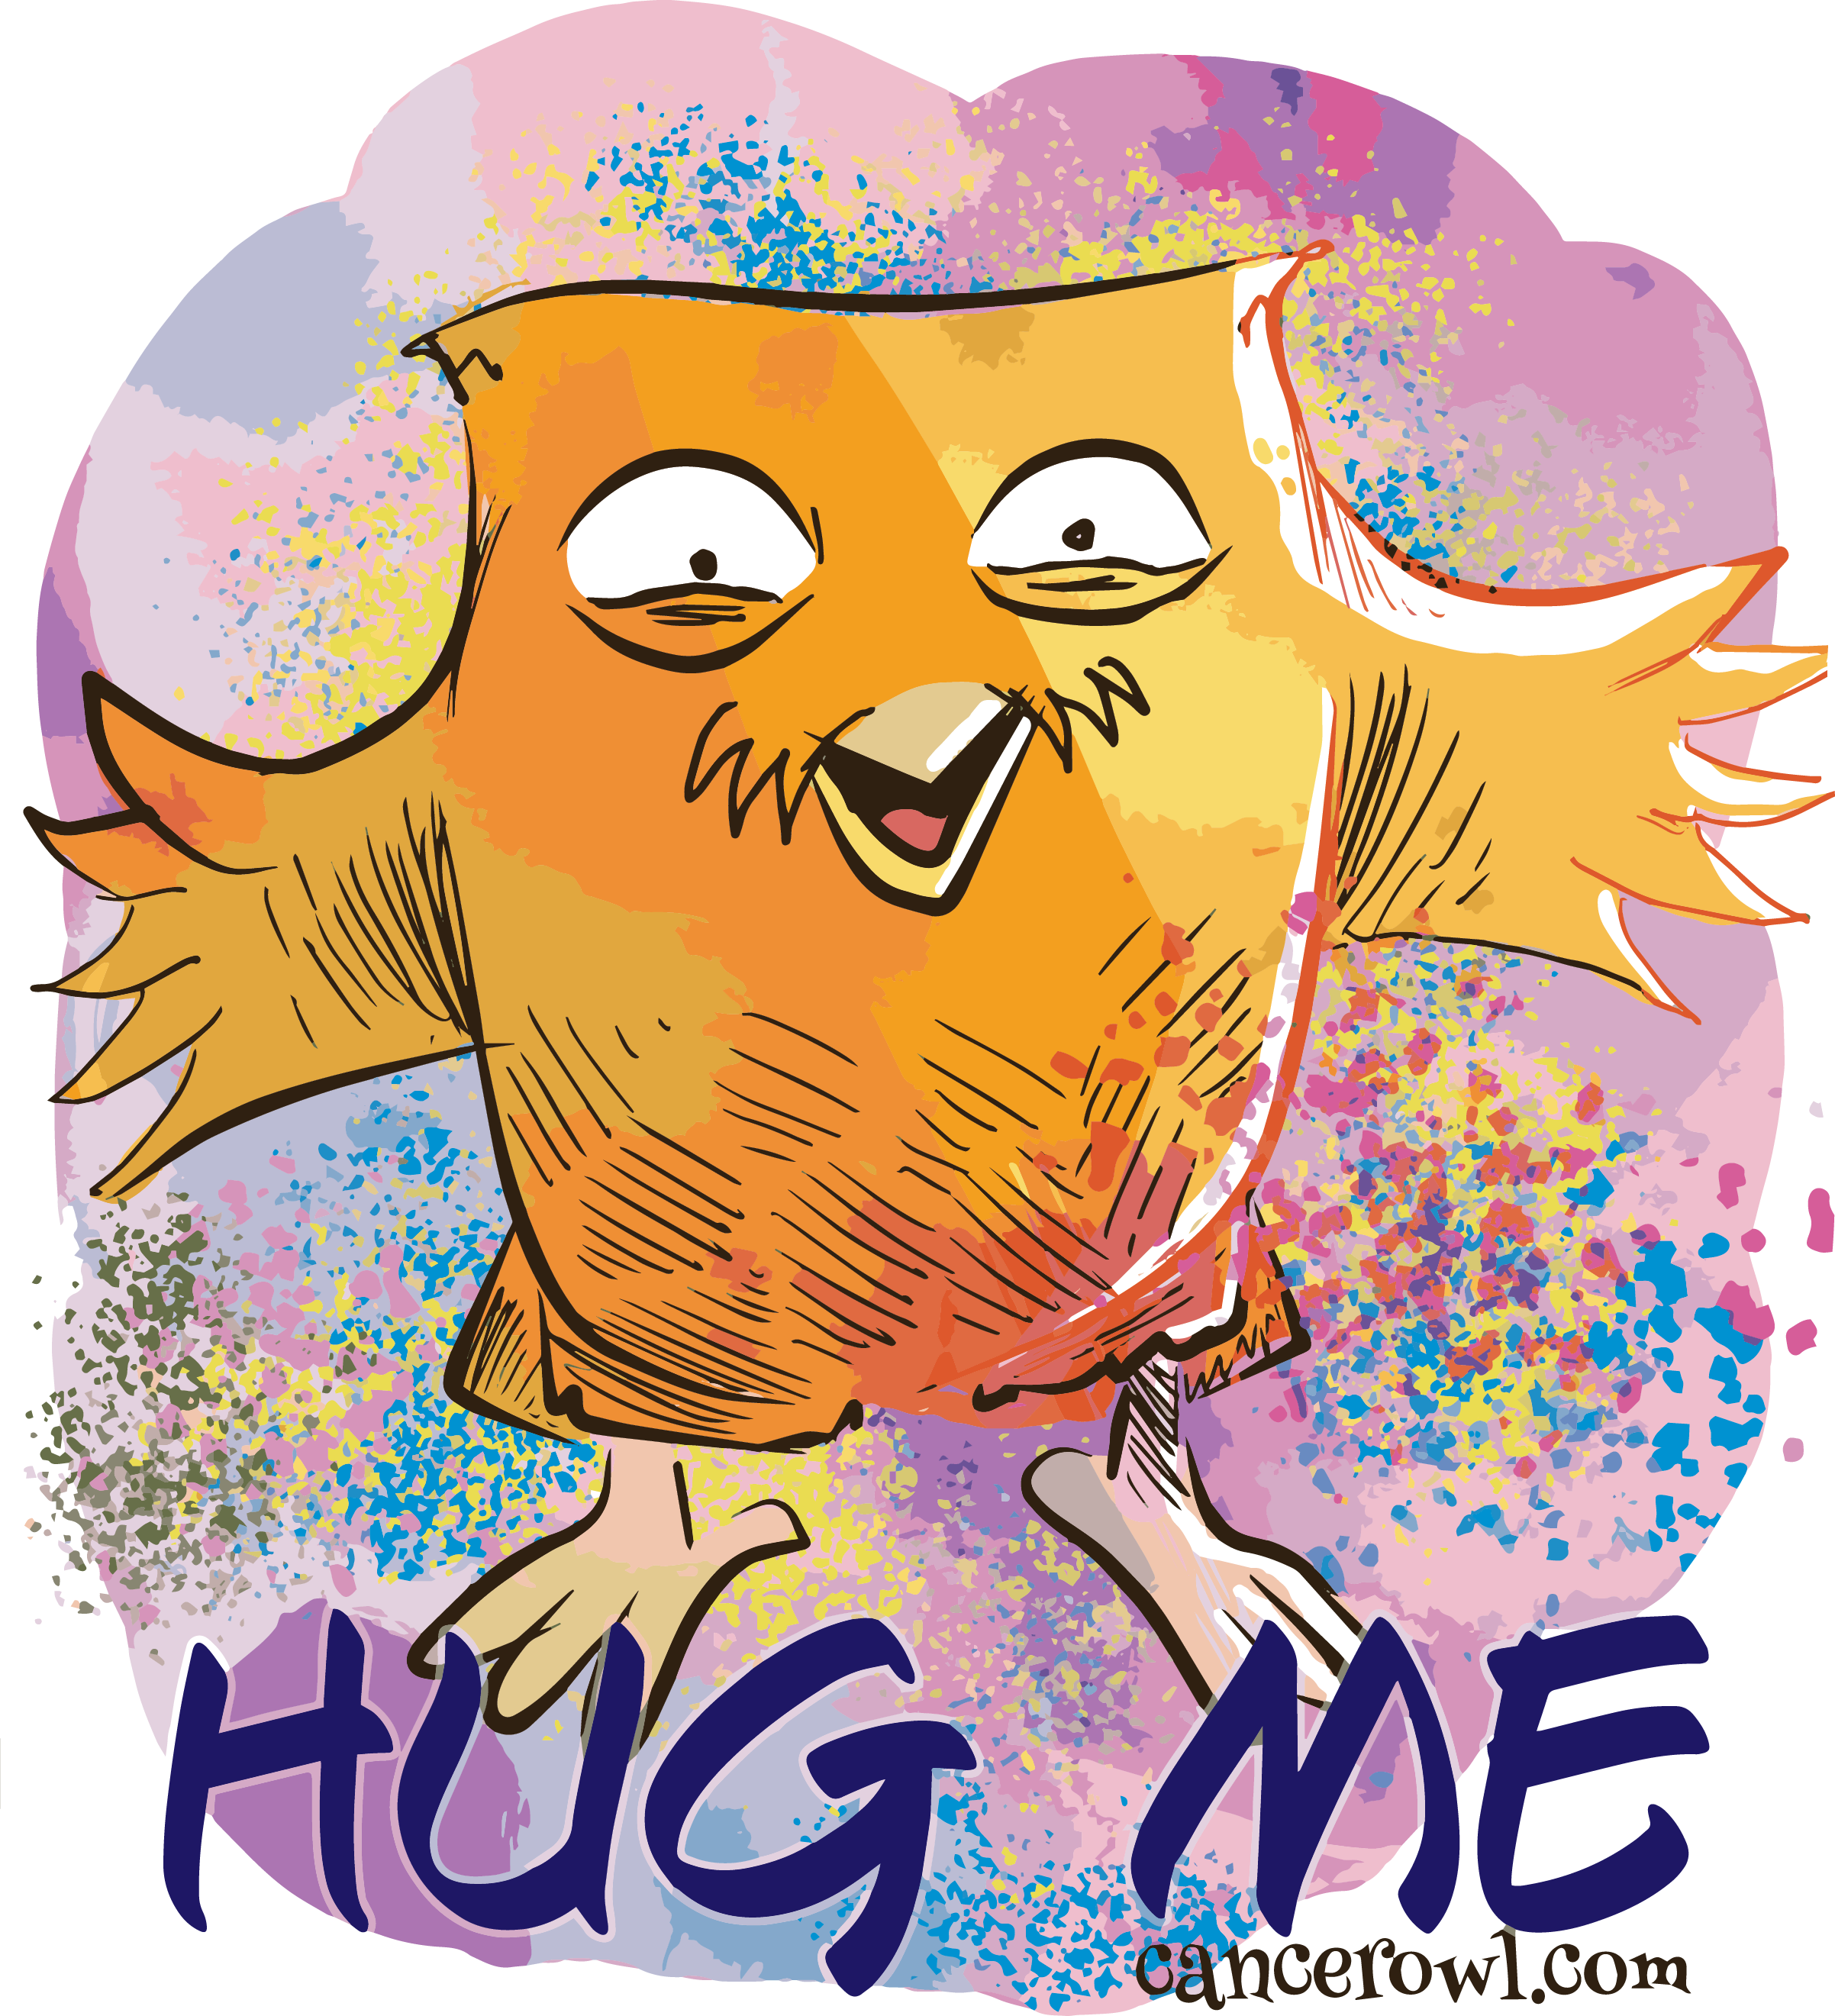 Cancer Owl Store Logo